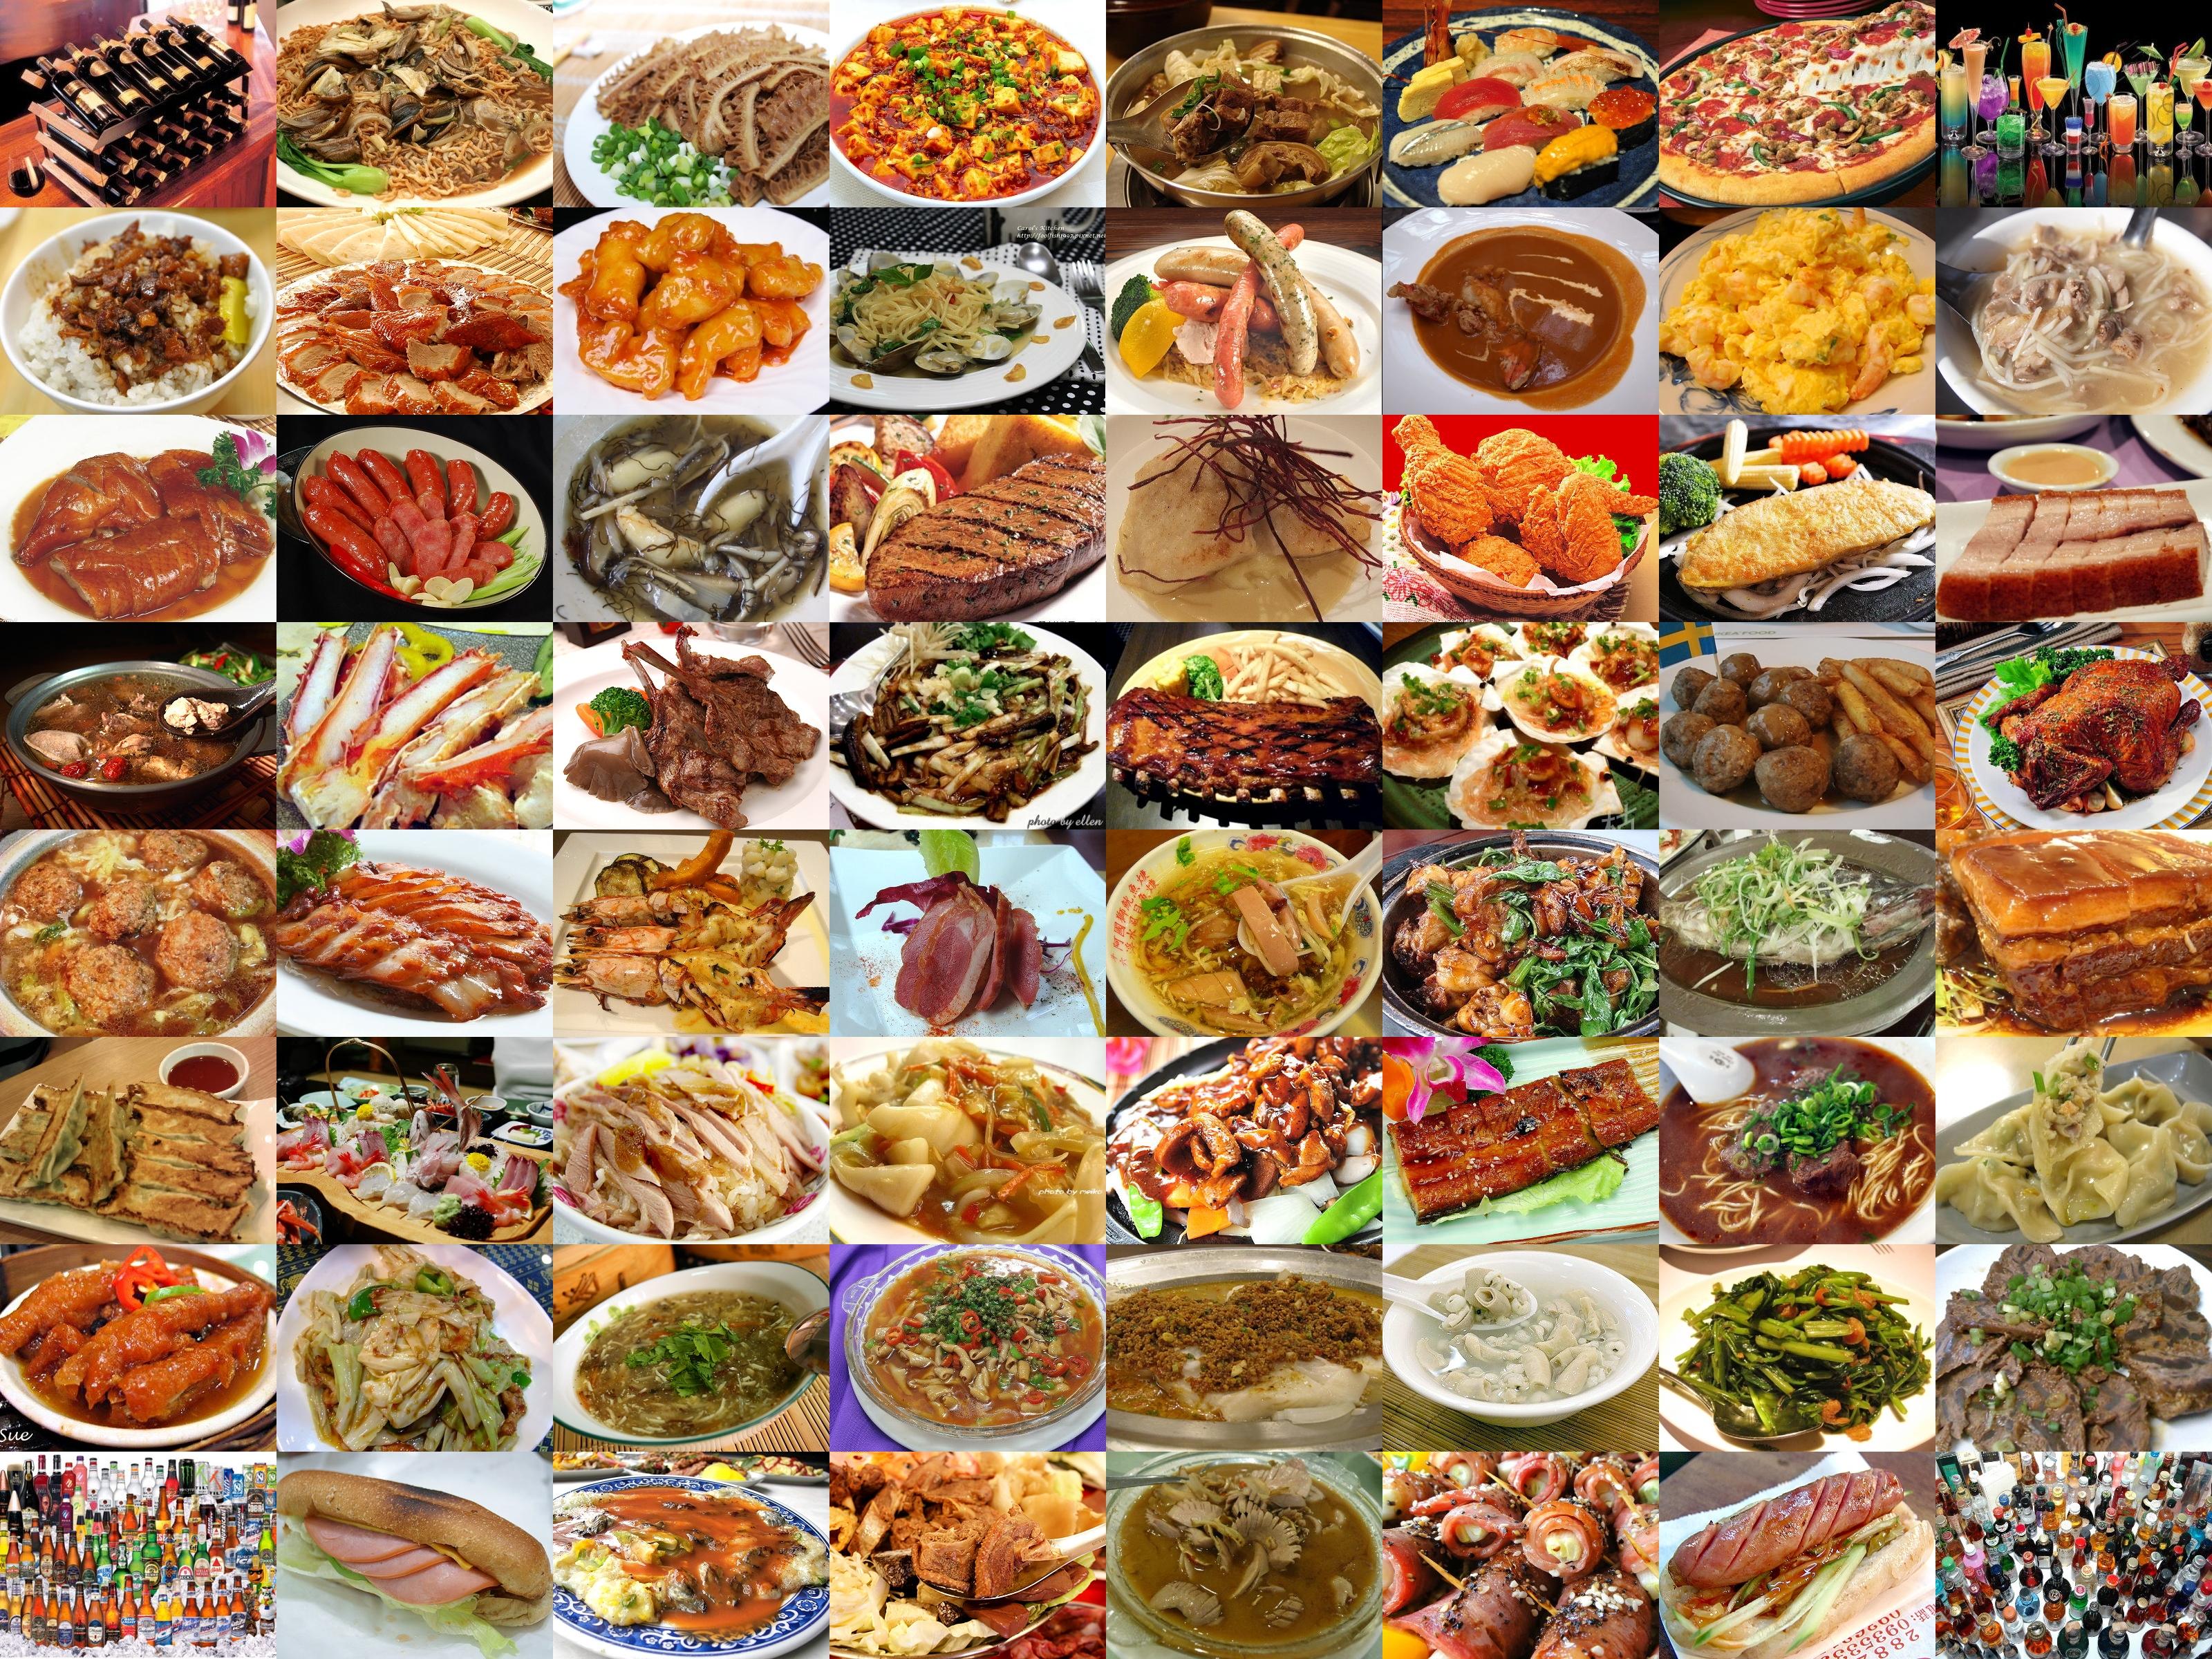 Wallpaper Of 64 Kinds Of Delicious Foods Desktop Backgrounds Wallpaper 3200x2400